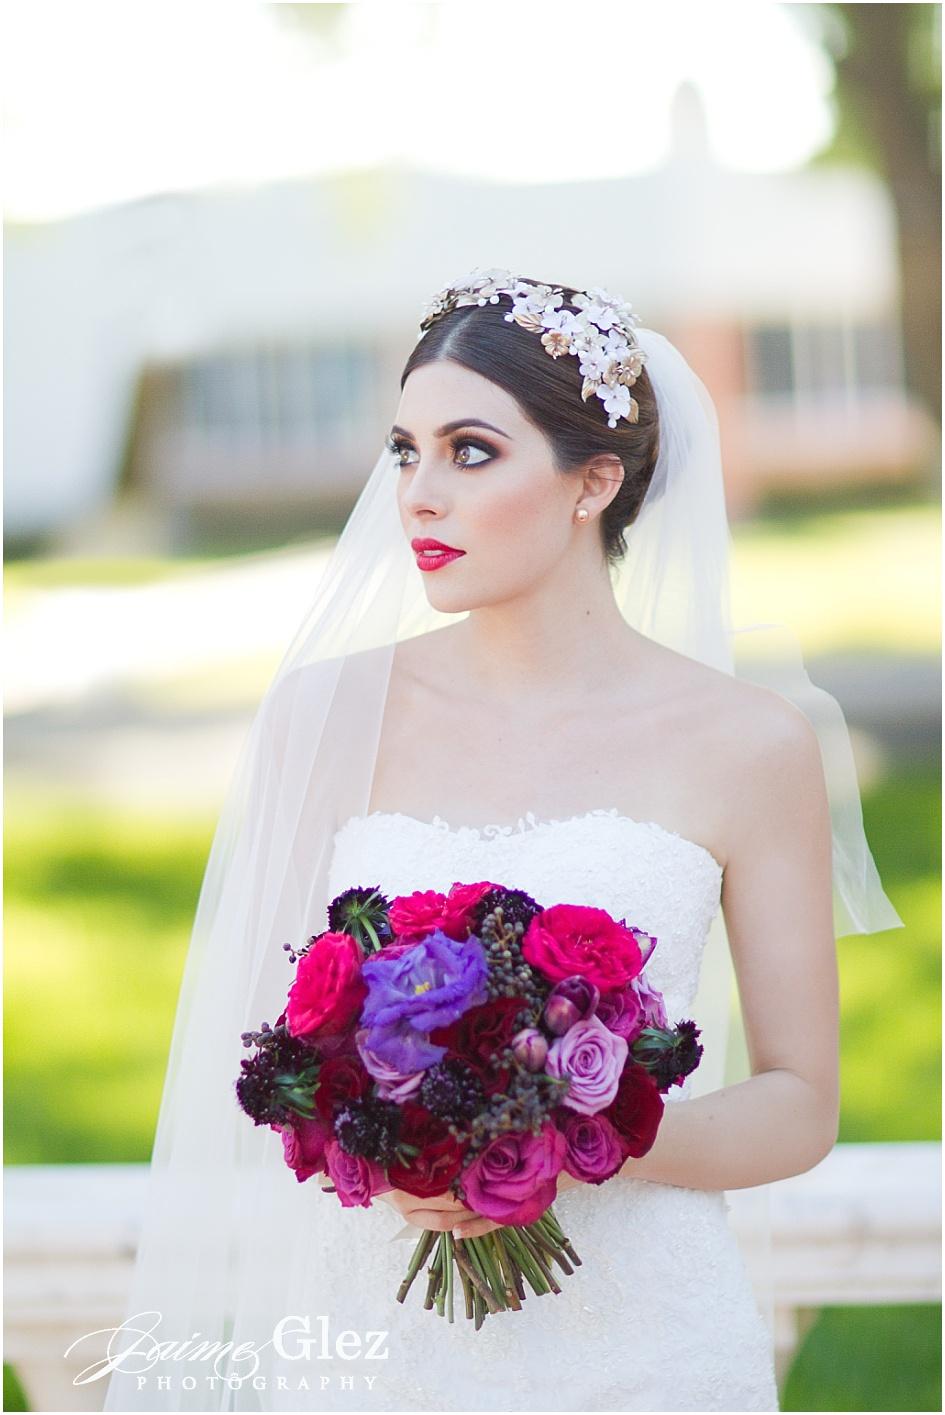 fotografos de bodas en merida yucatan 4